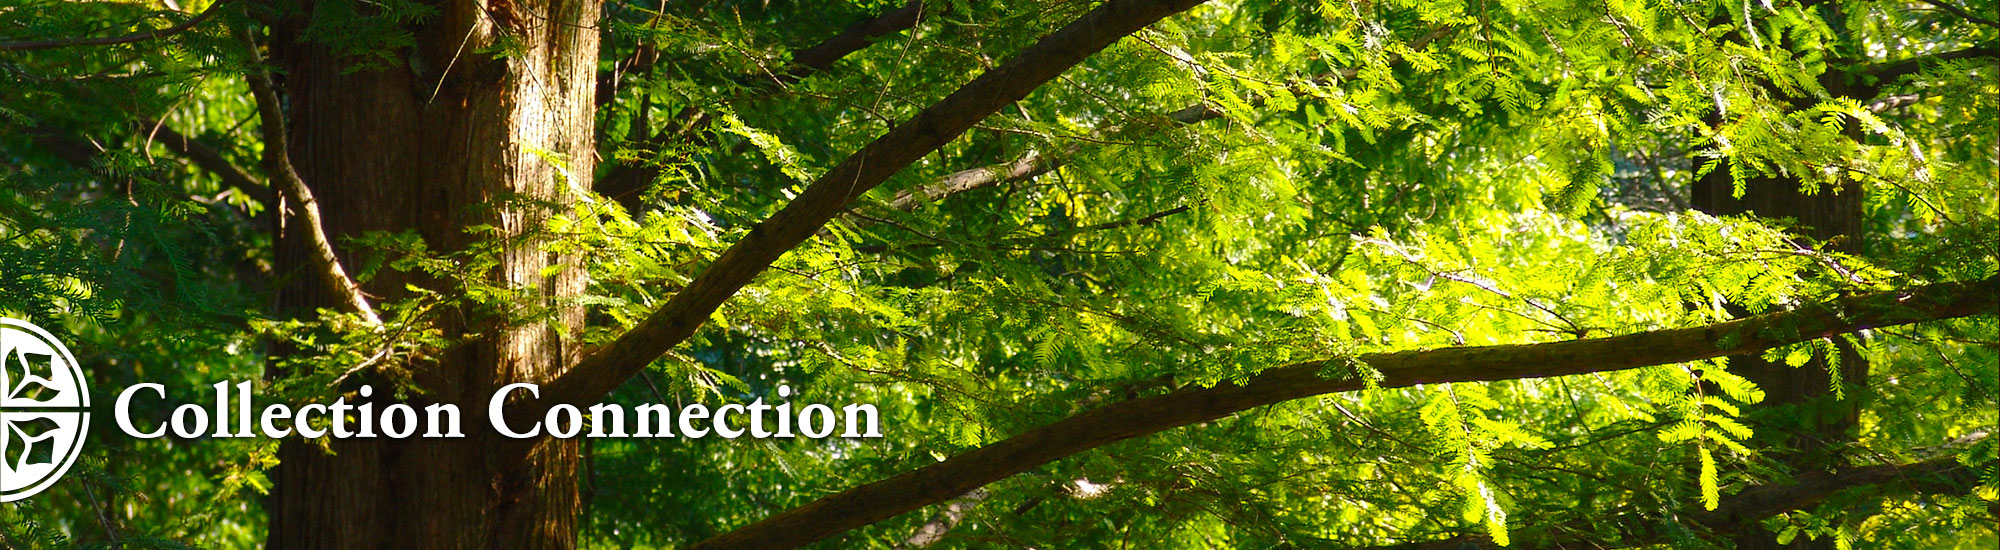 Collection Connection at Morris Arboretum